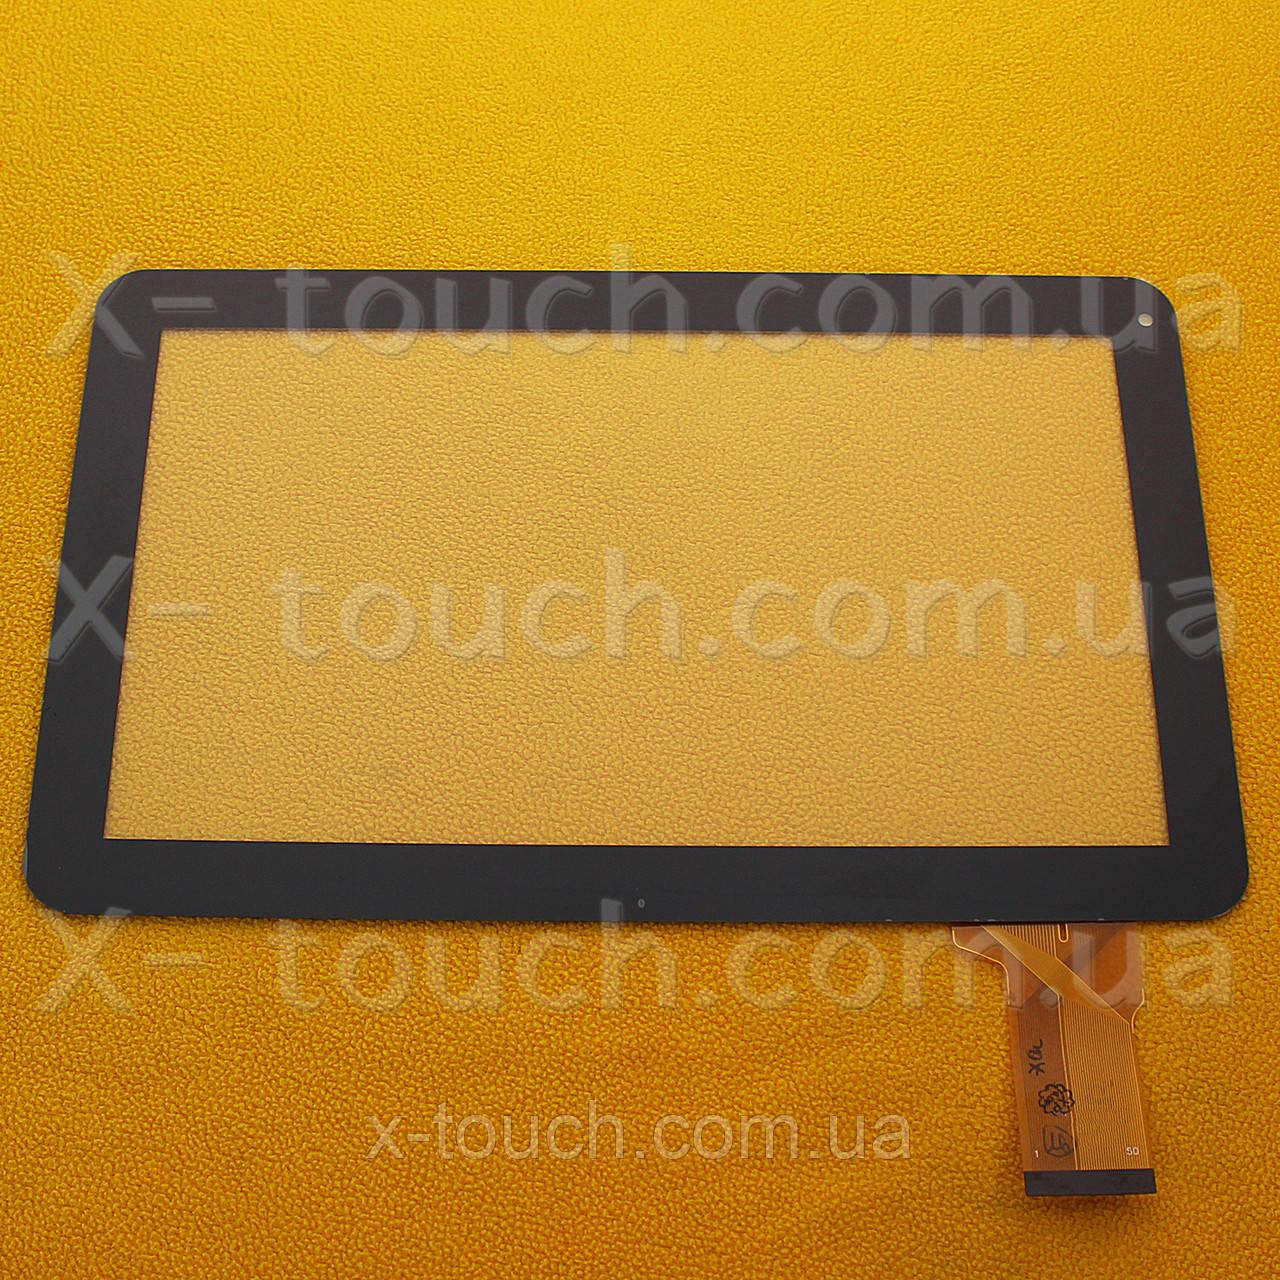 Тачскрин, сенсор  QLT 1007C—PW  для планшета